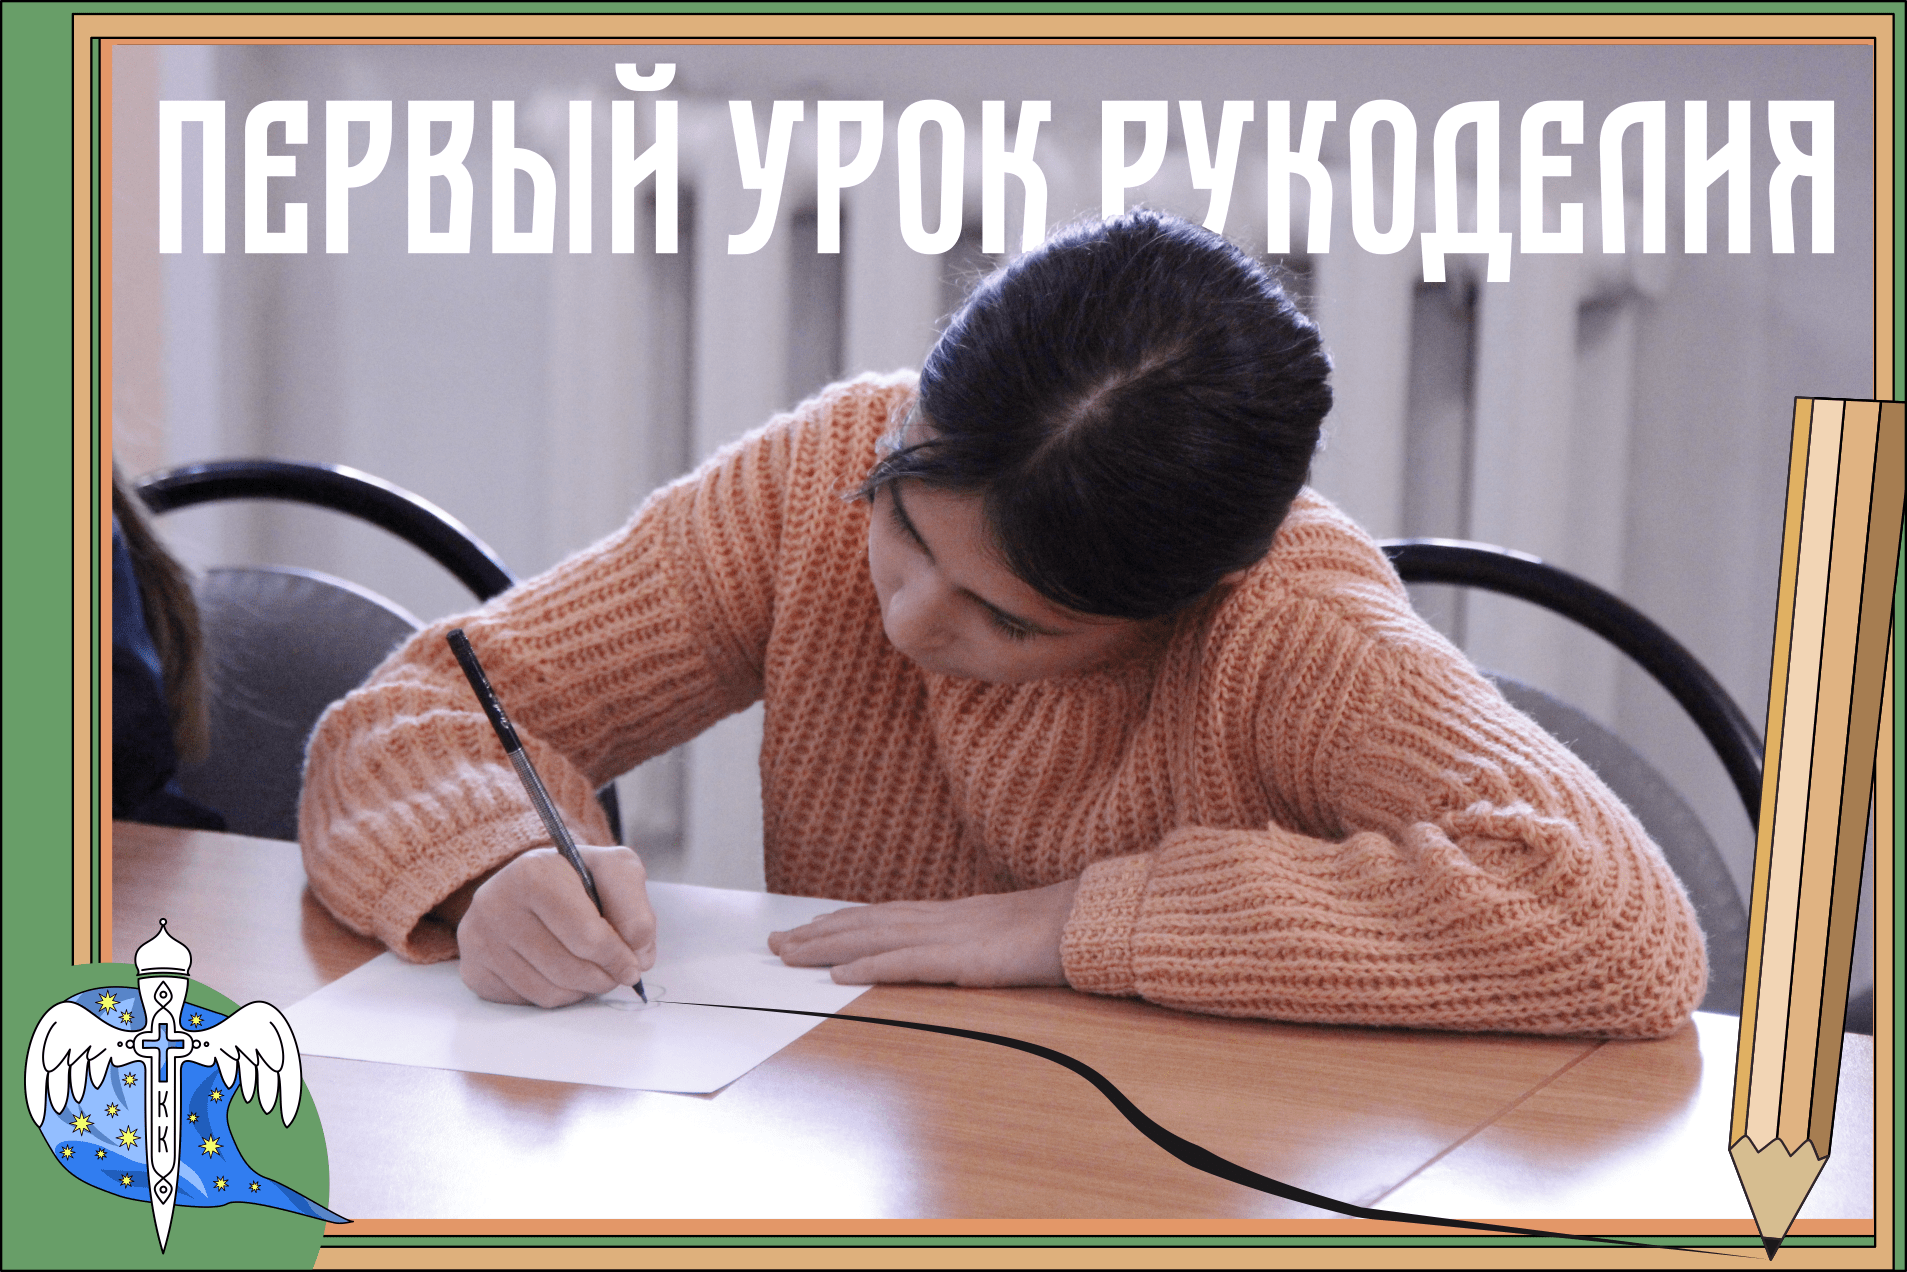 http://monuspen.ru/photoreports/c23fce511b5f7b4837ce7f9428b223a7.png